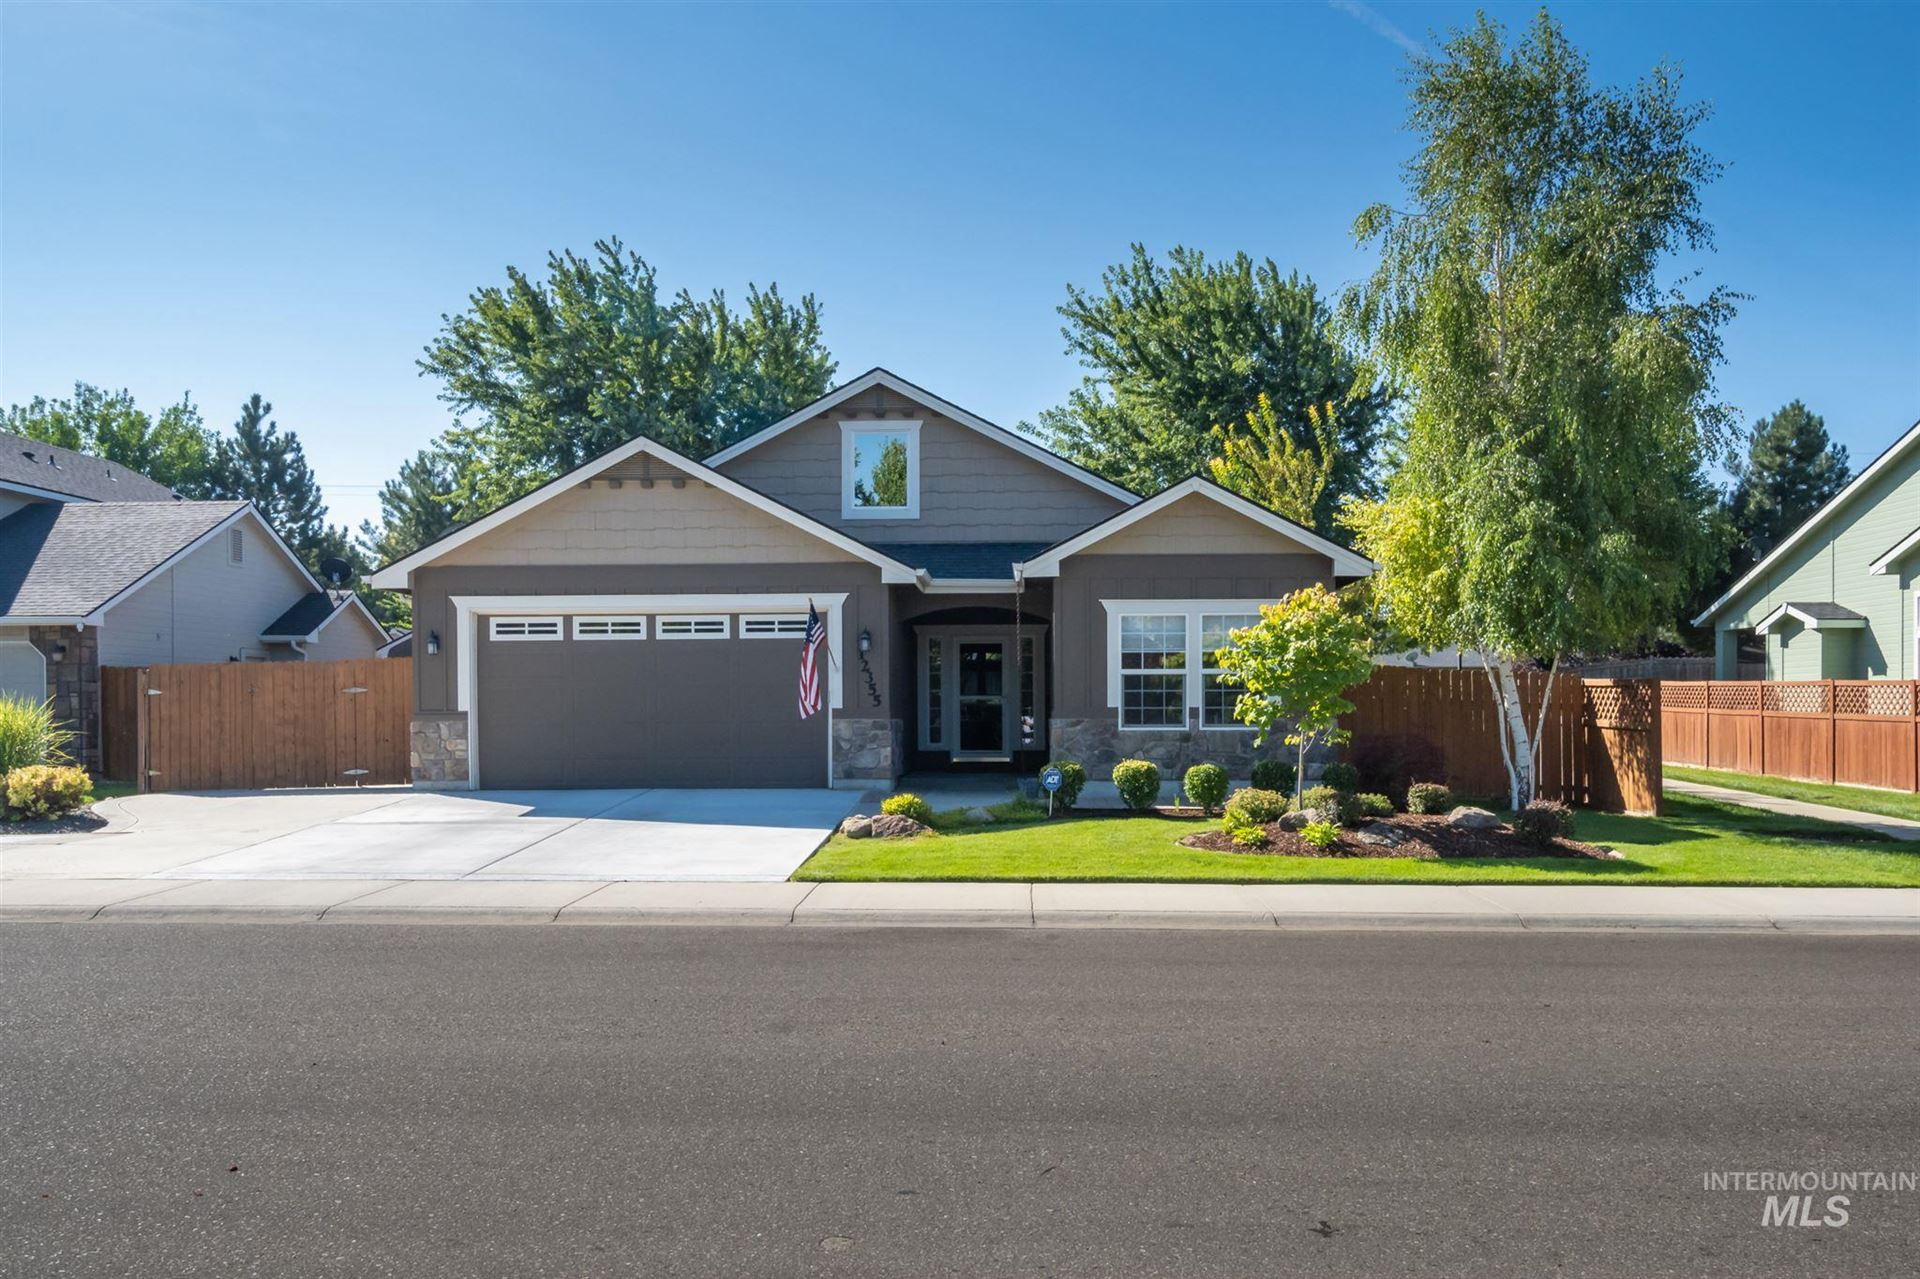 12355 W Berghan St, Boise, ID 83709 - MLS#: 98780361